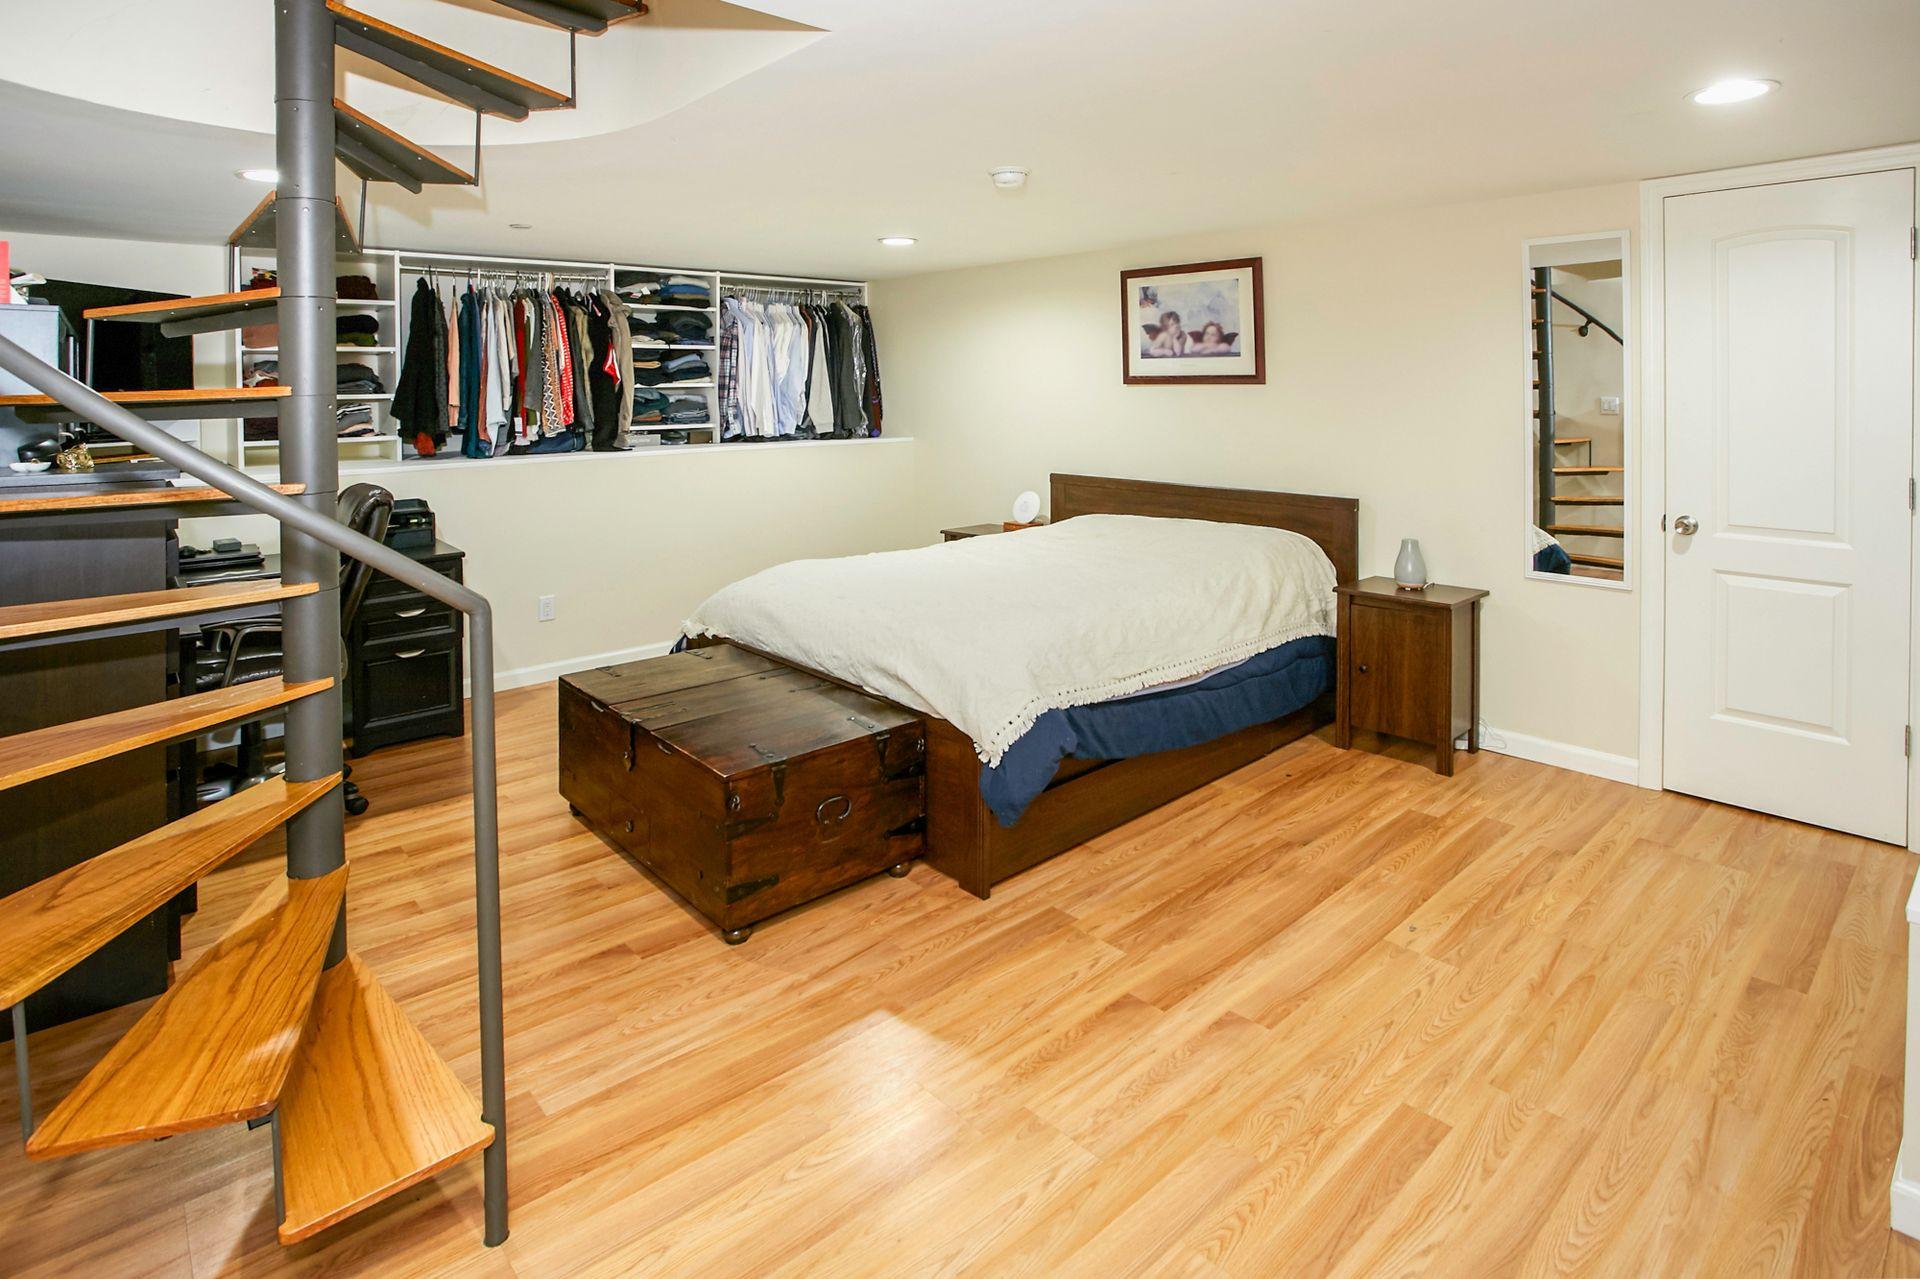 hardwood flooring queens ny of 30 39 32nd street unit 1a astoria ny mirador real estate with 504f0359c7a36c99cab882e464d1074a